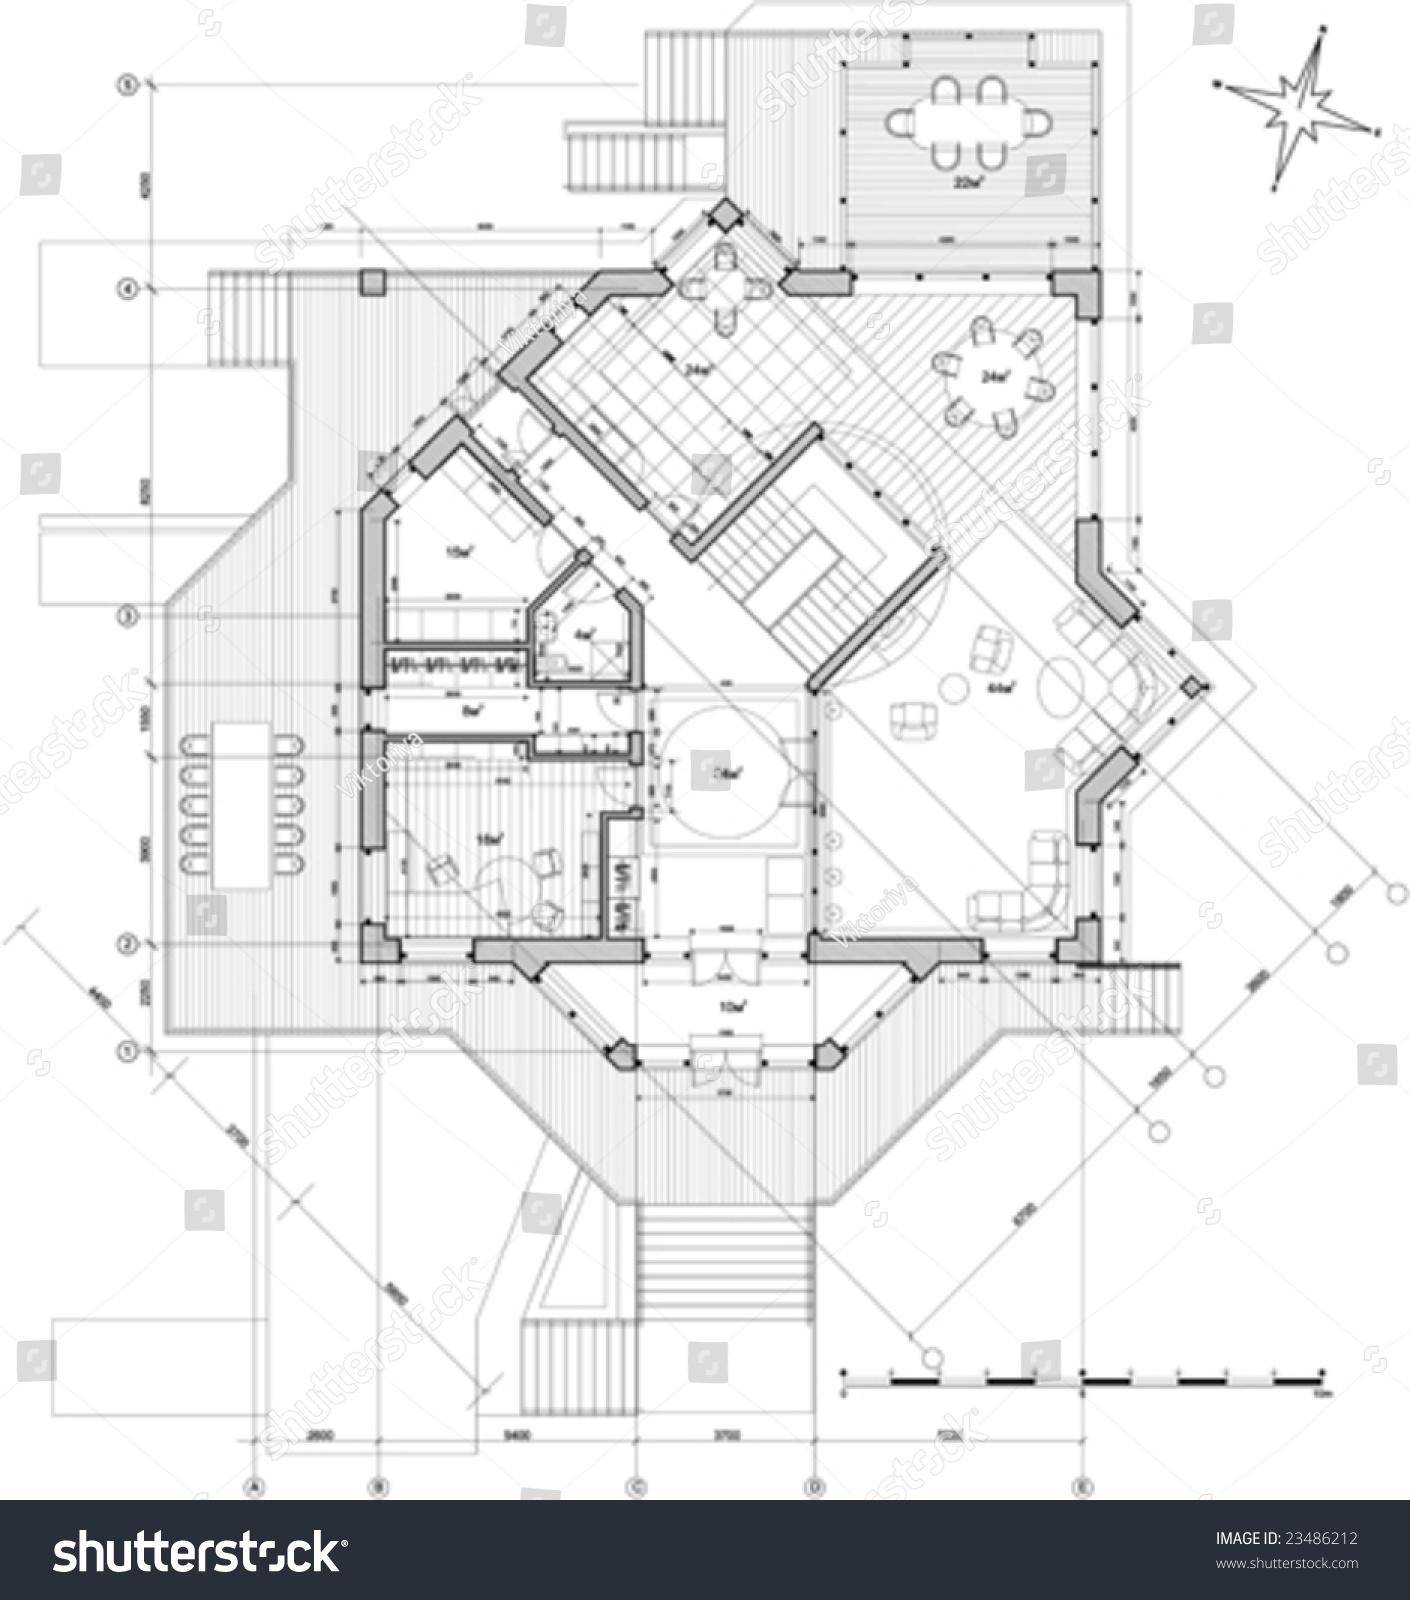 House Plan Vector Stock Vector HD (Royalty Free) 23486212 - Shutterstock